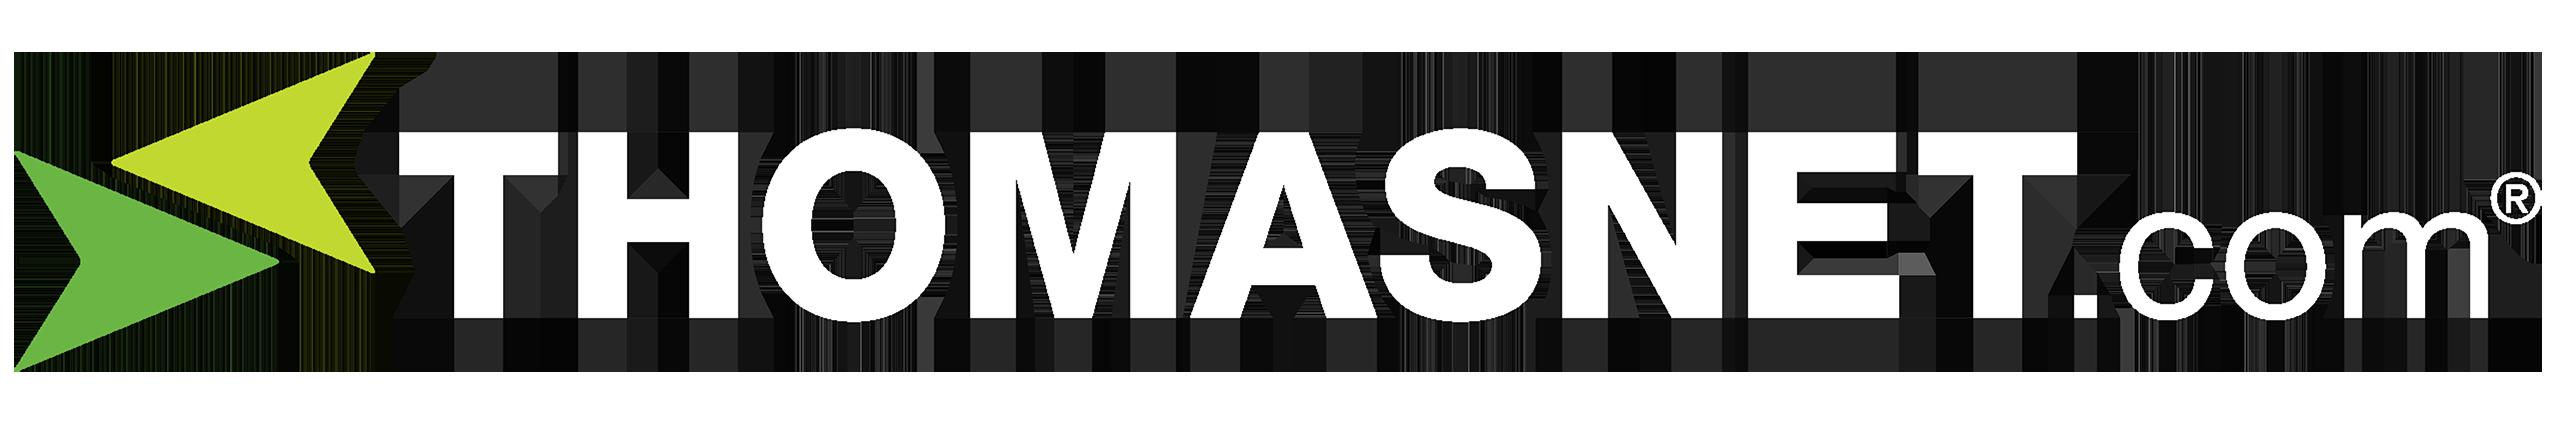 logo-thomasnet-light.png